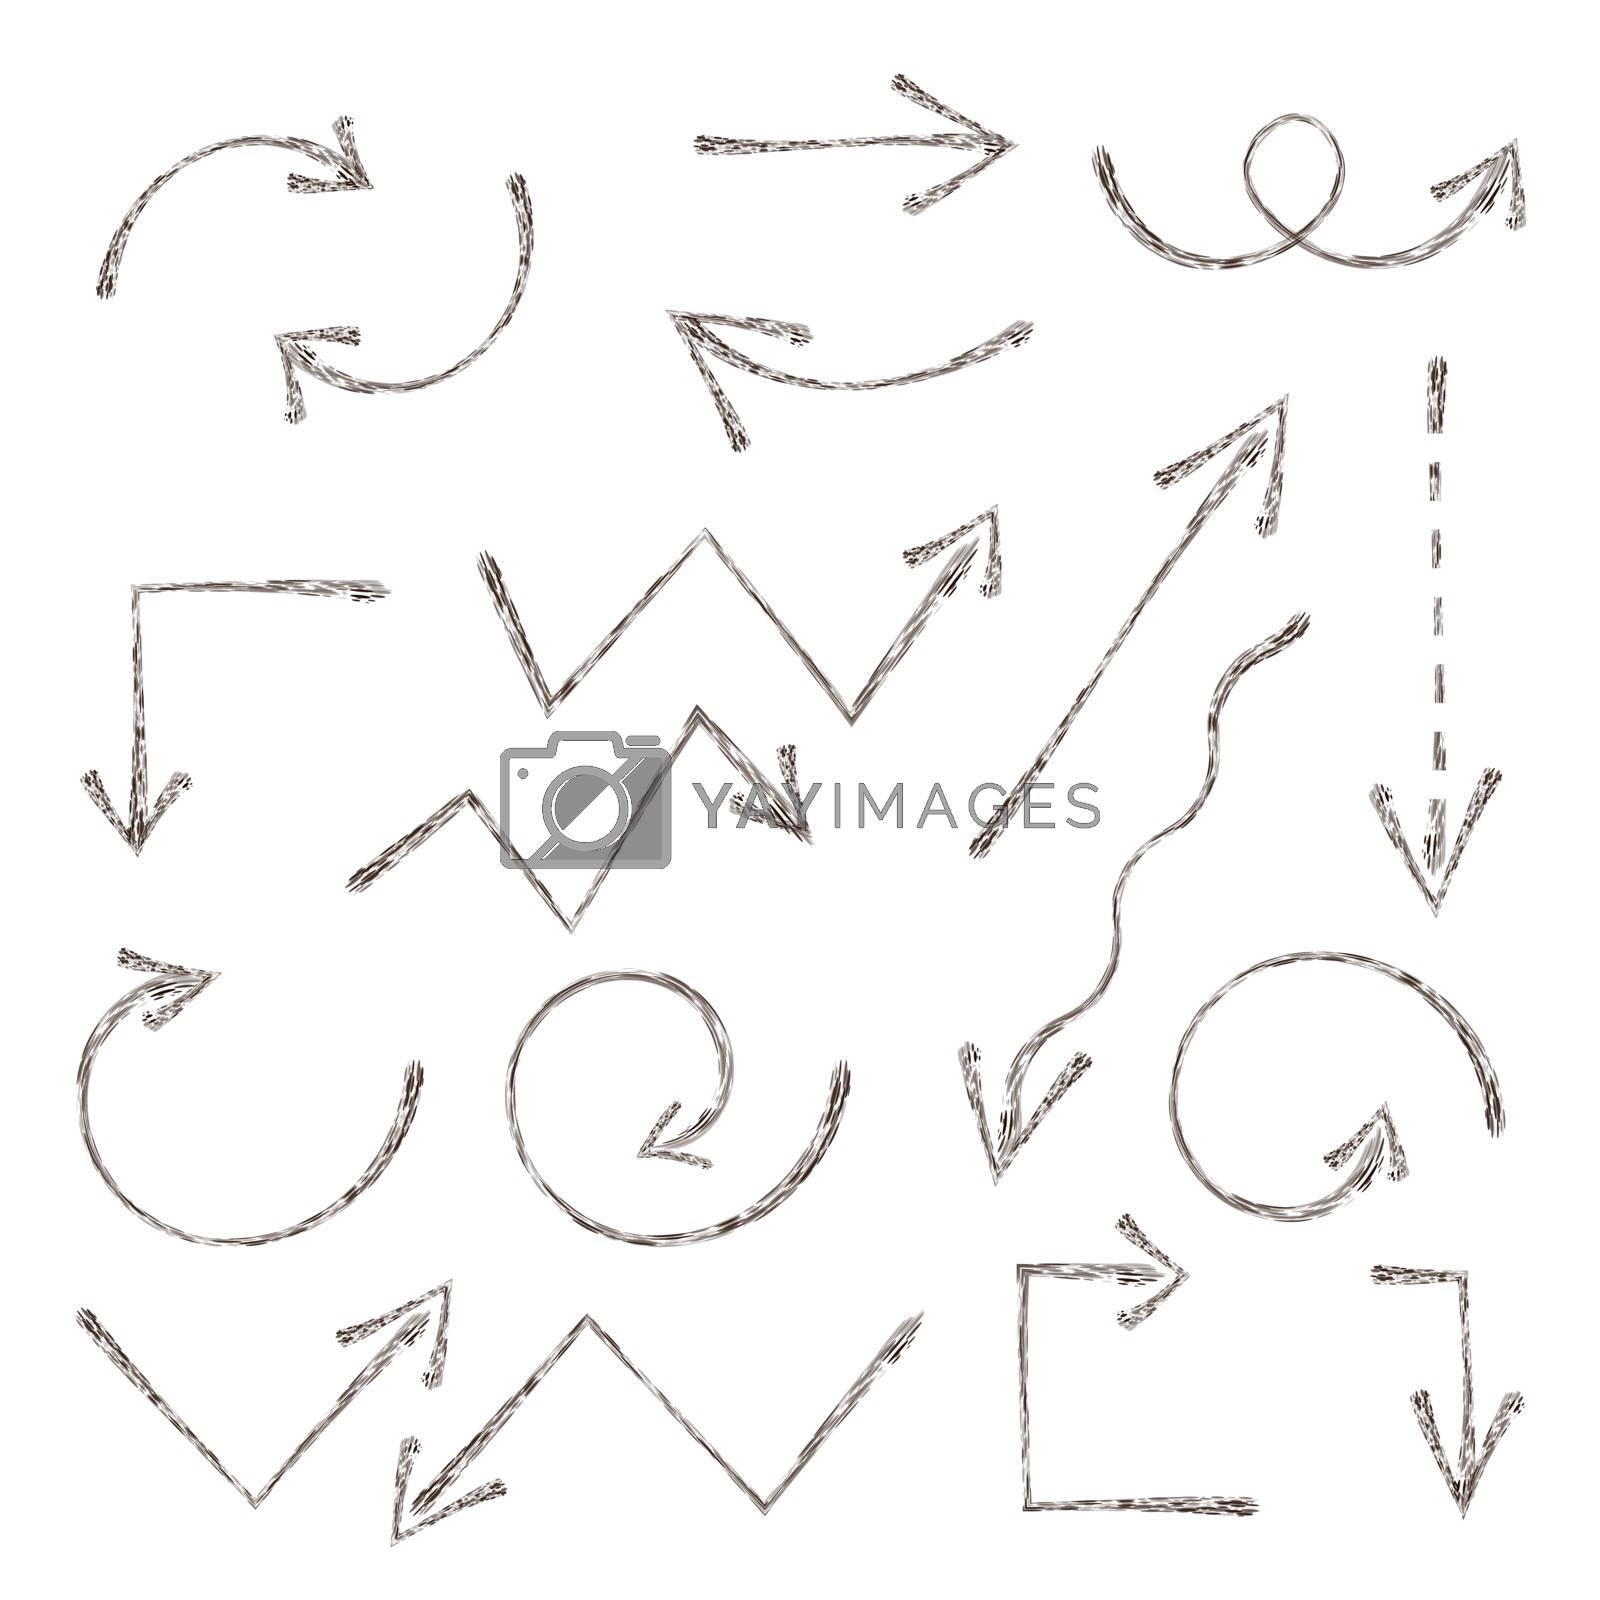 Royalty free image of Grunge sketch arrow. Hand drawn ink arrows set. Handdrawn element by Elena_Garder